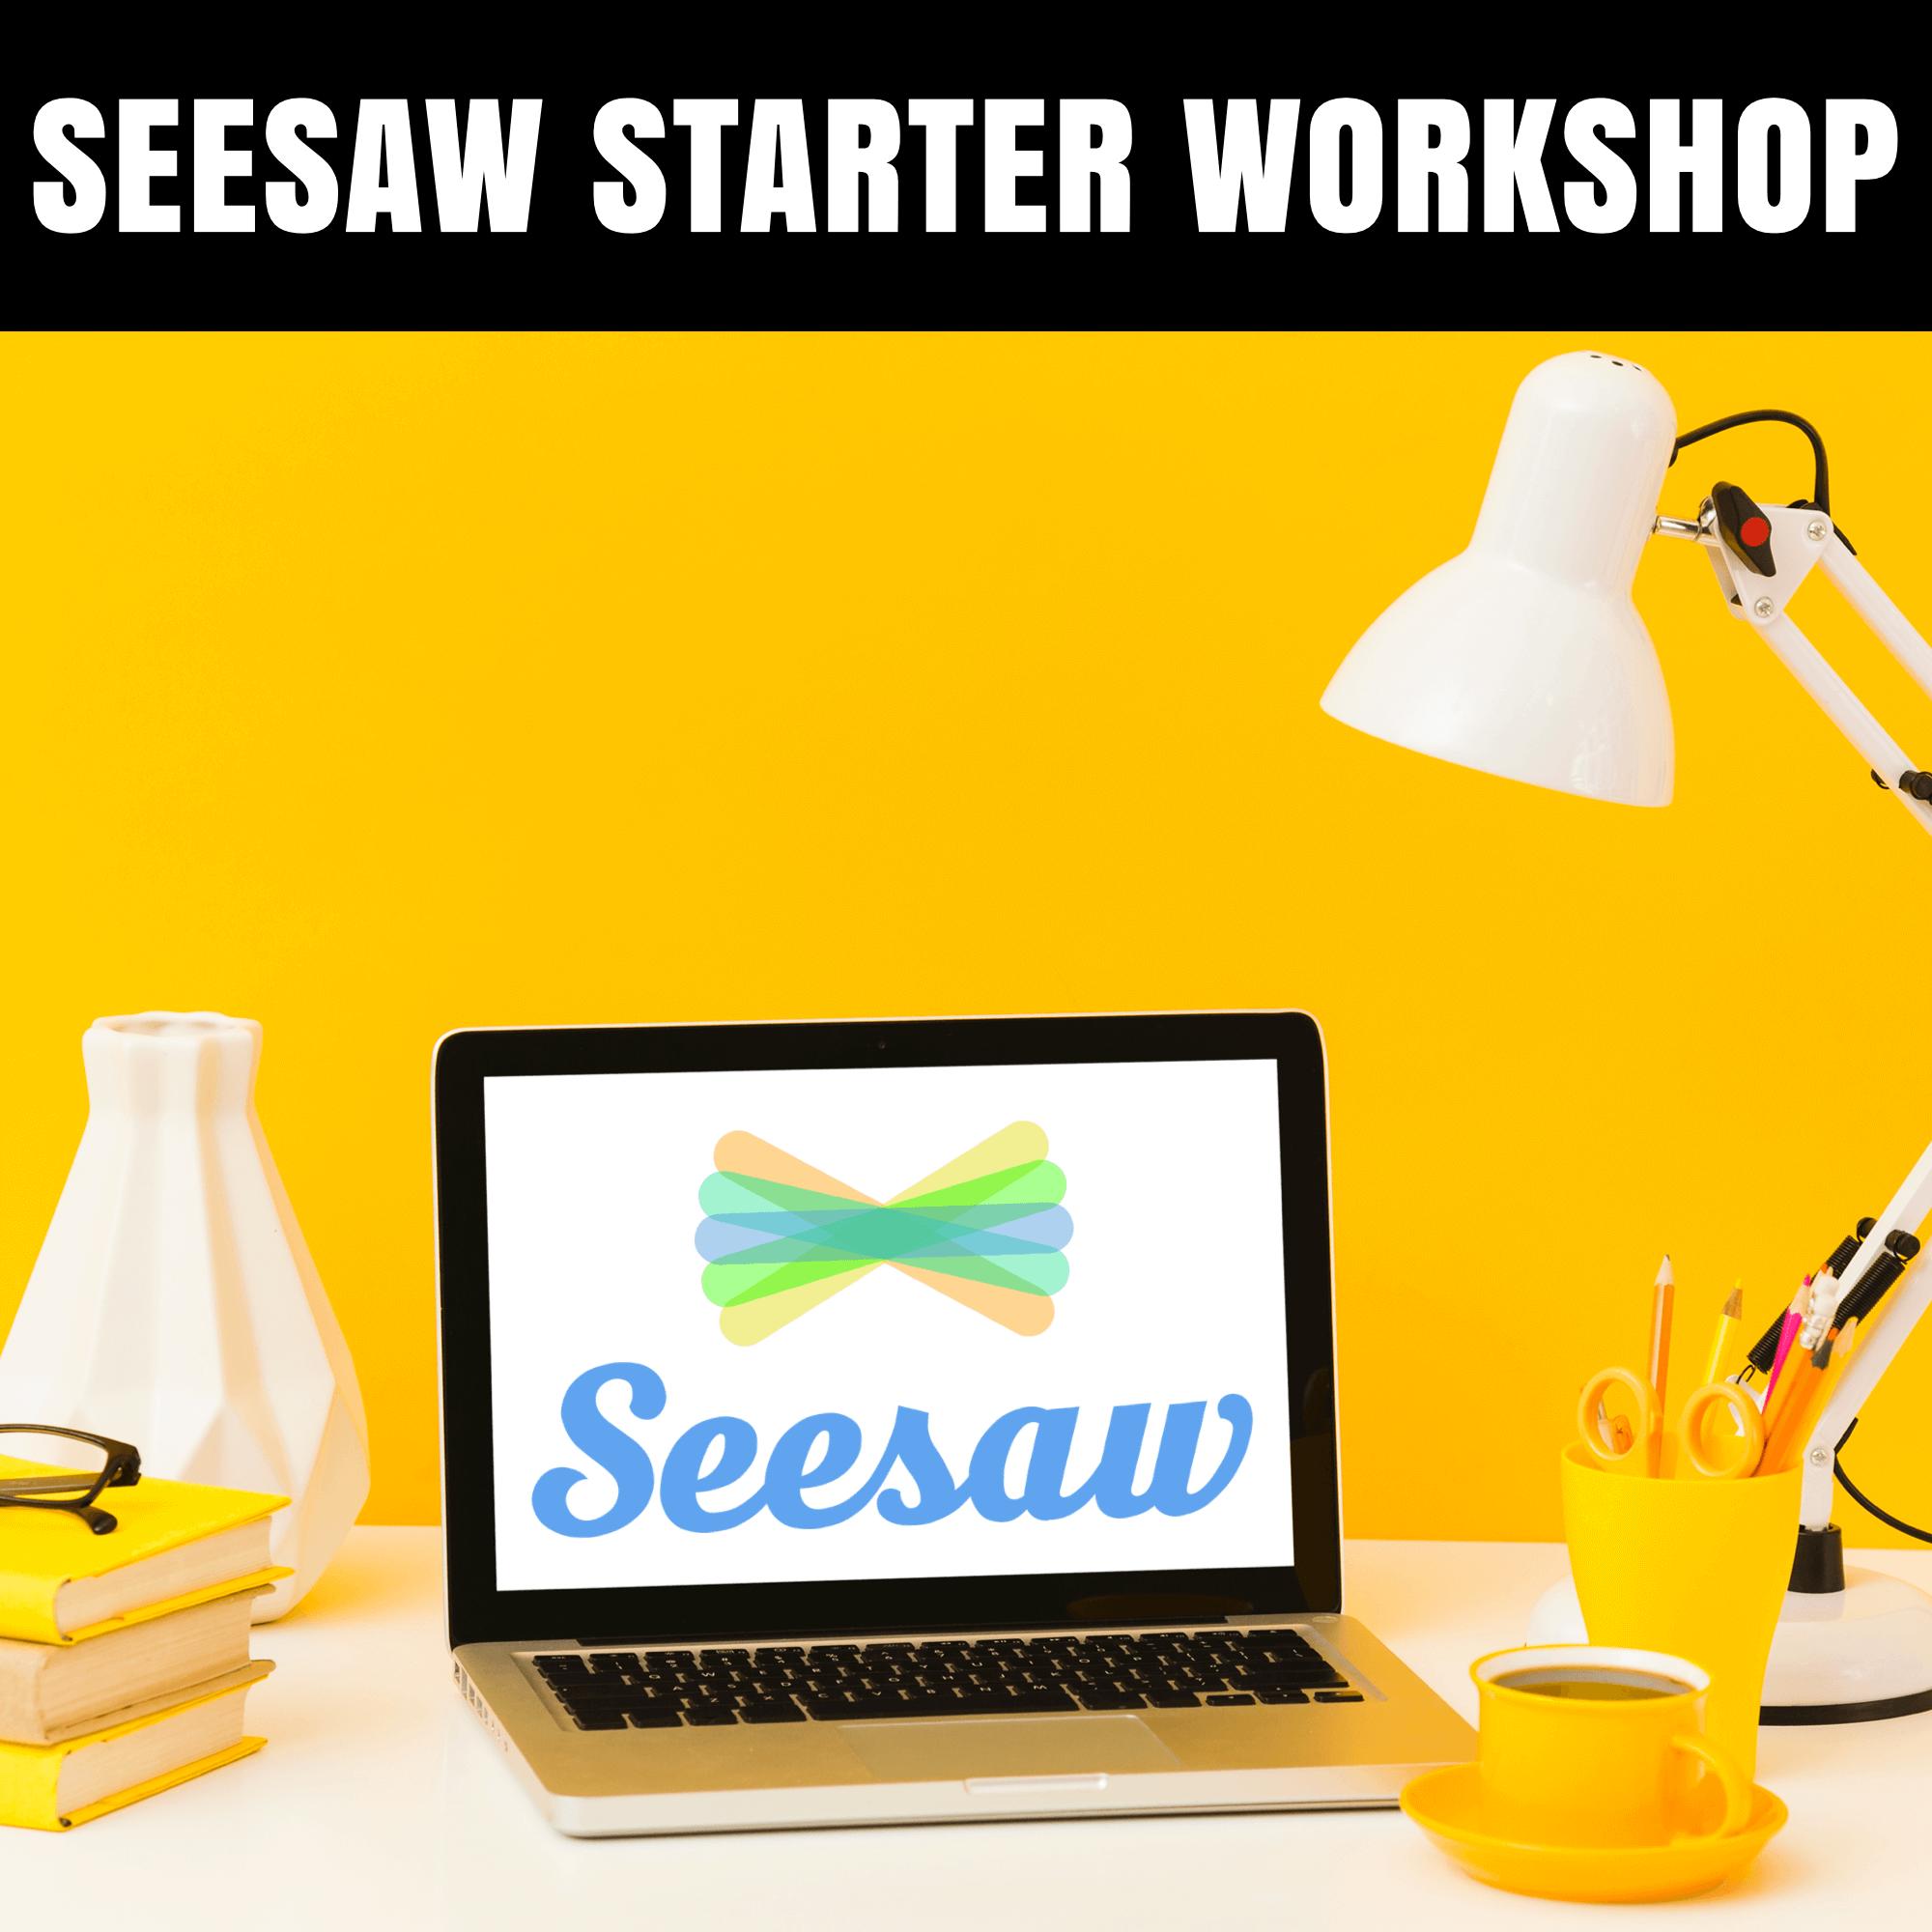 Seesaw Starter Workshop